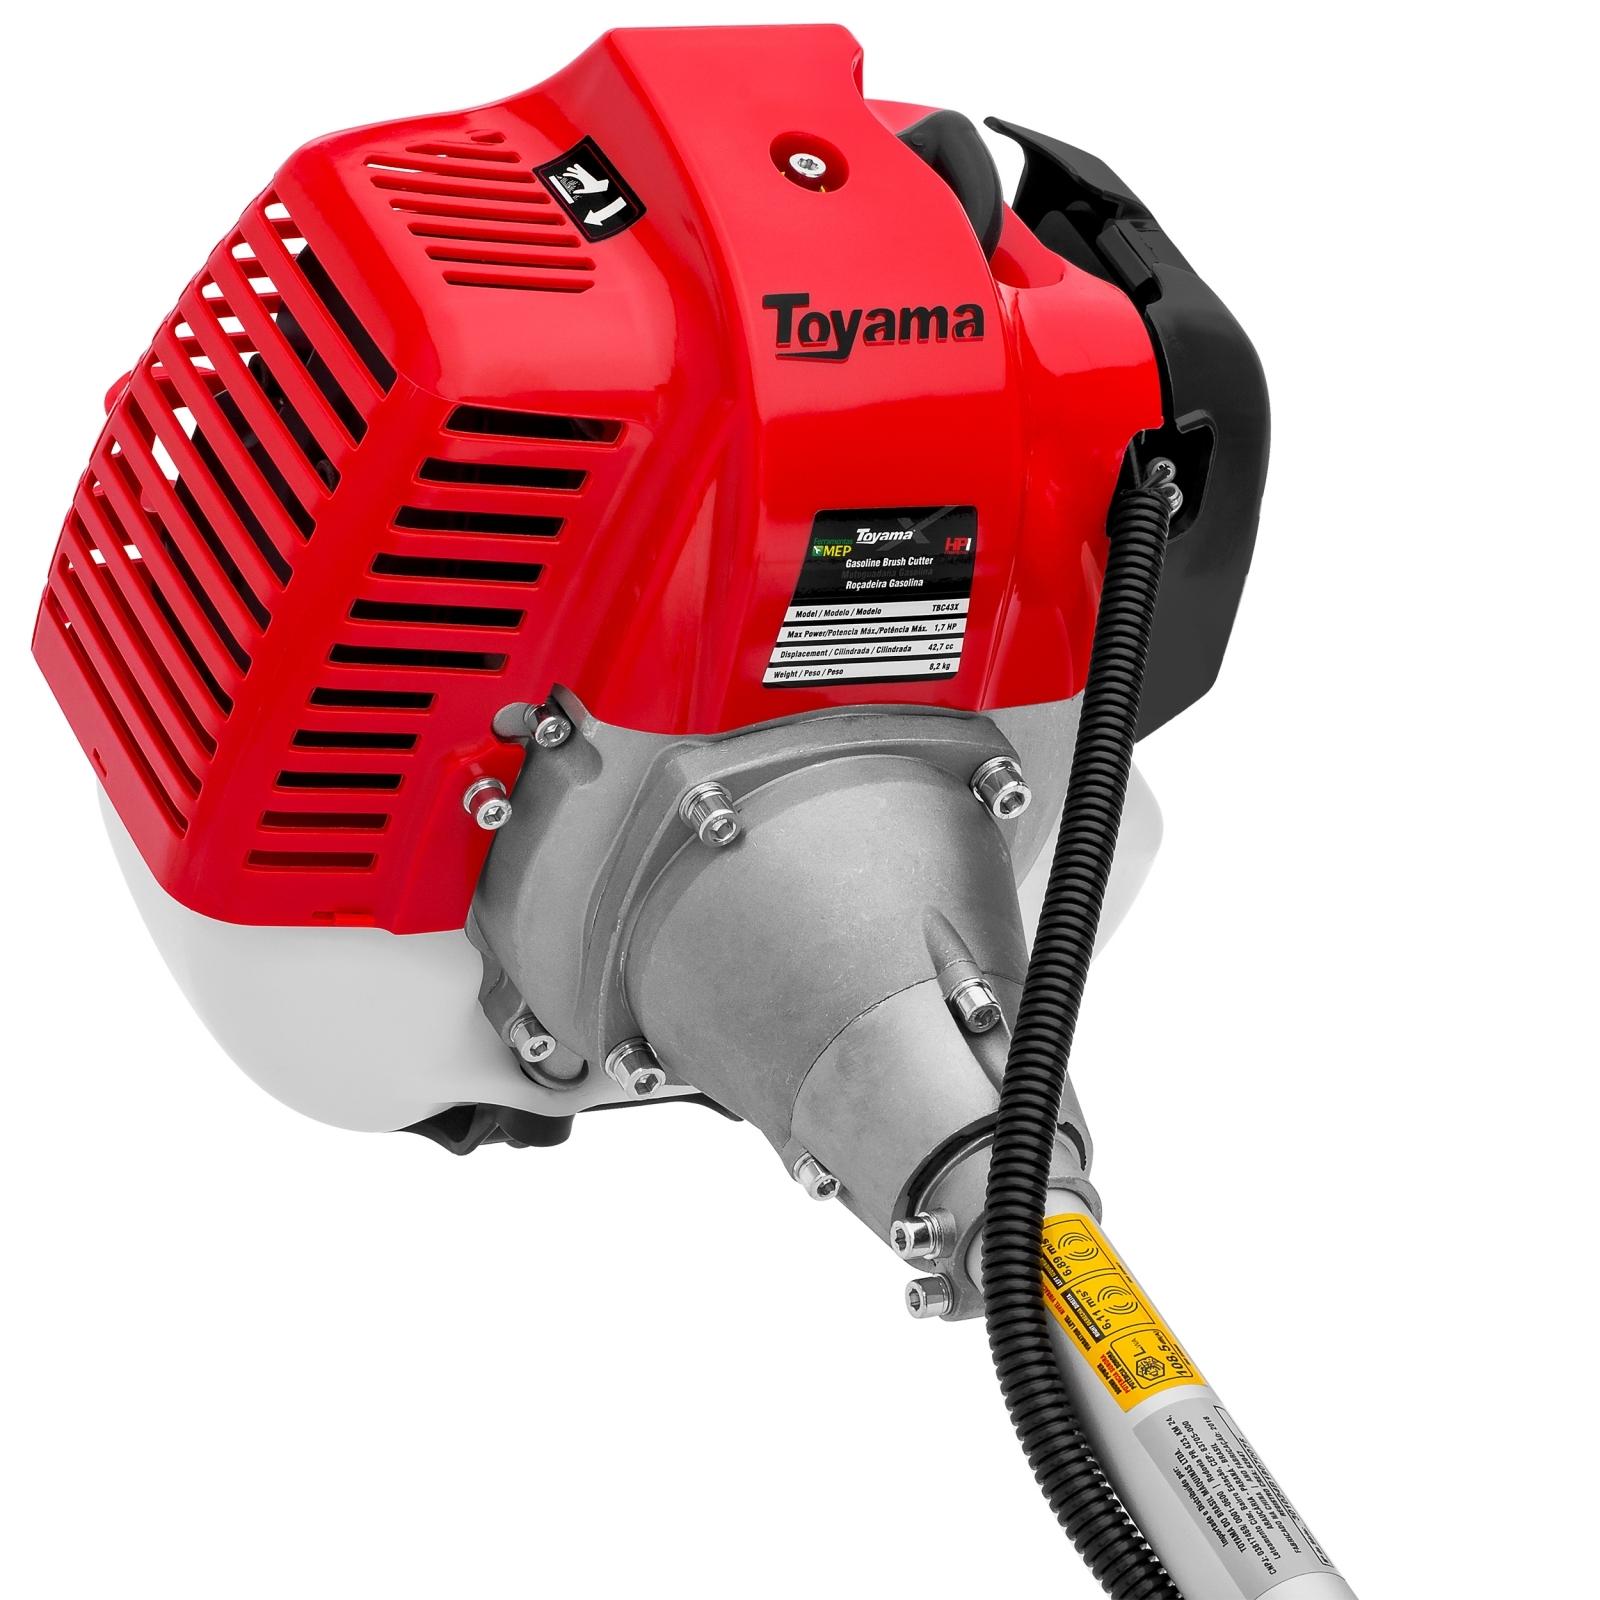 Roçadeira A Gasolina Toyama Tbc43x 42,7cc  - Ferramentas MEP